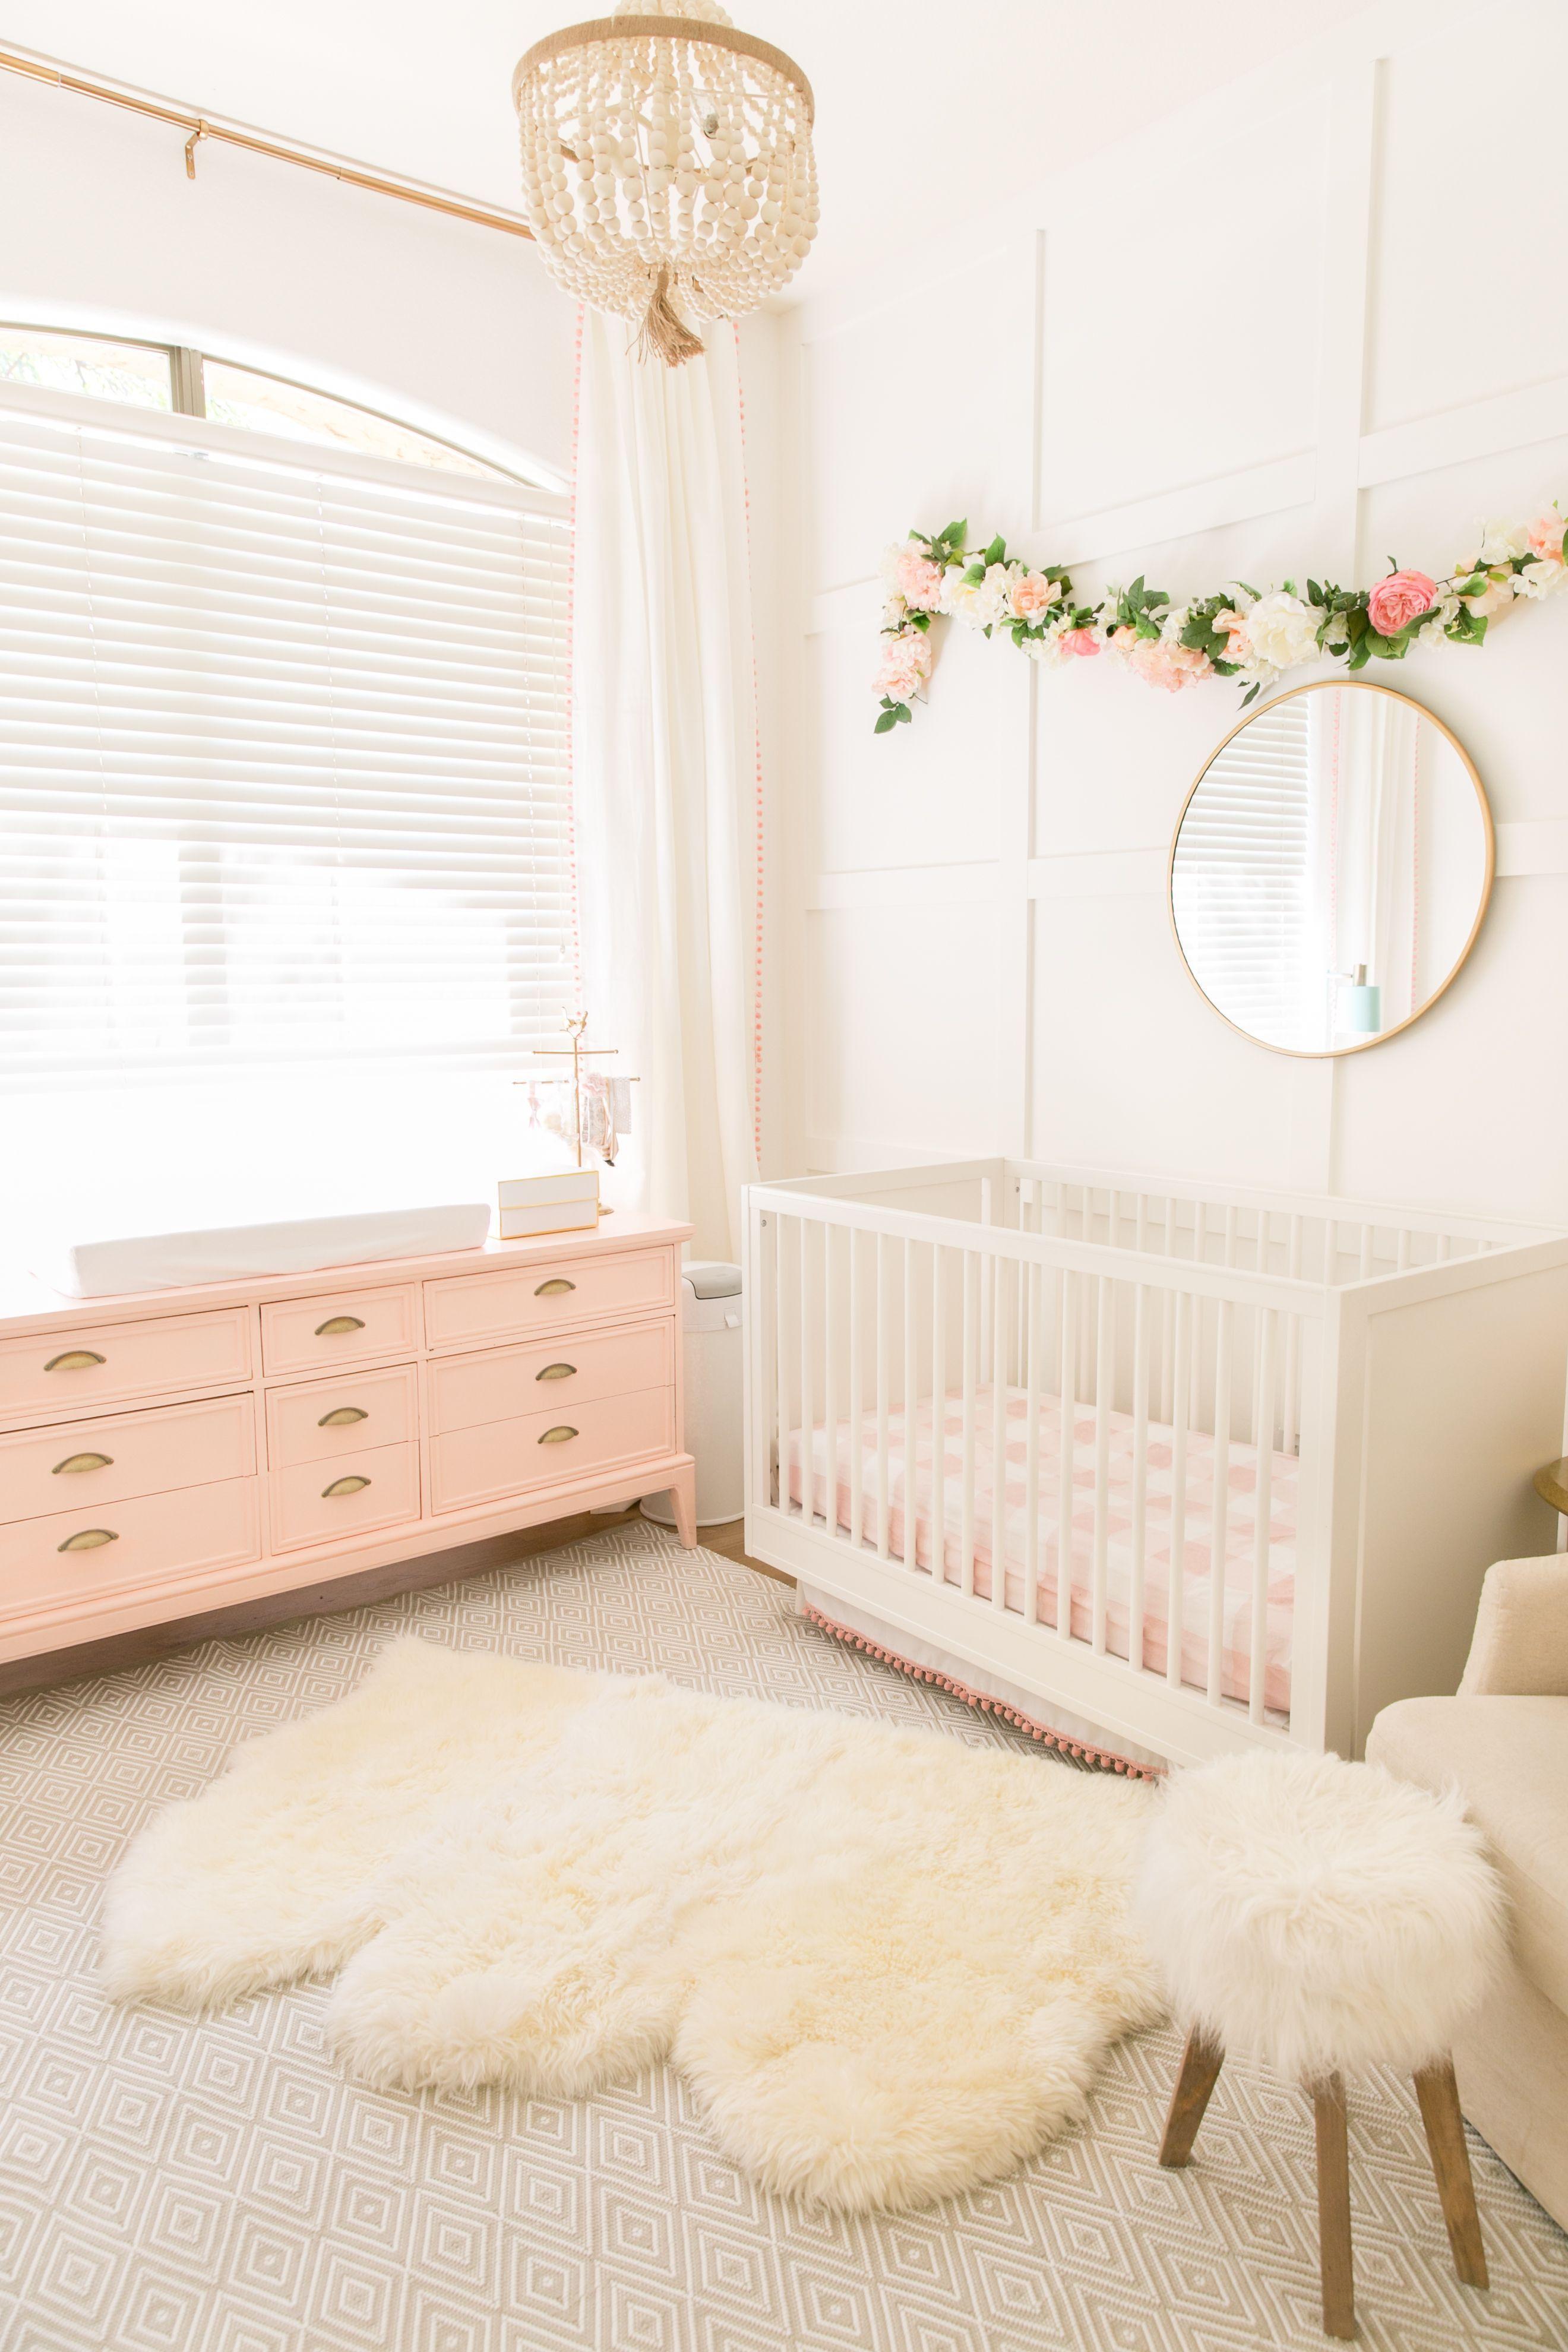 Design A Baby Room Online